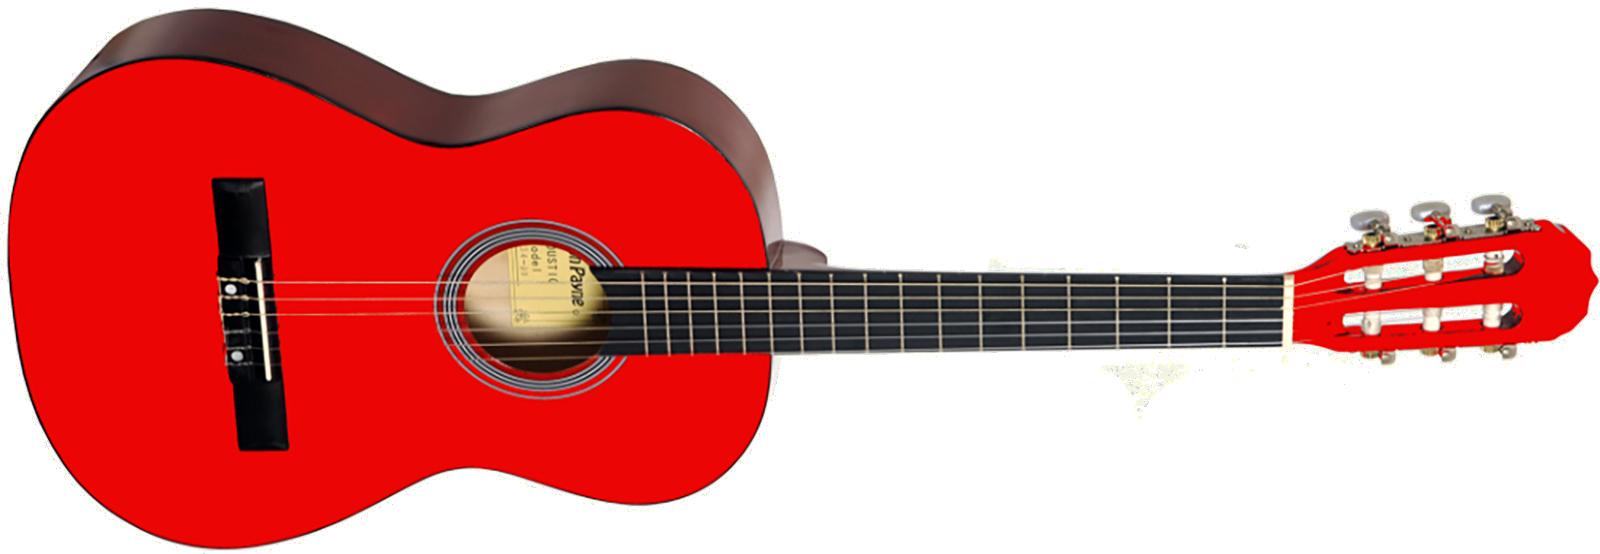 jpg transparent stock Acoustic clipart cute.  guitar lessons.